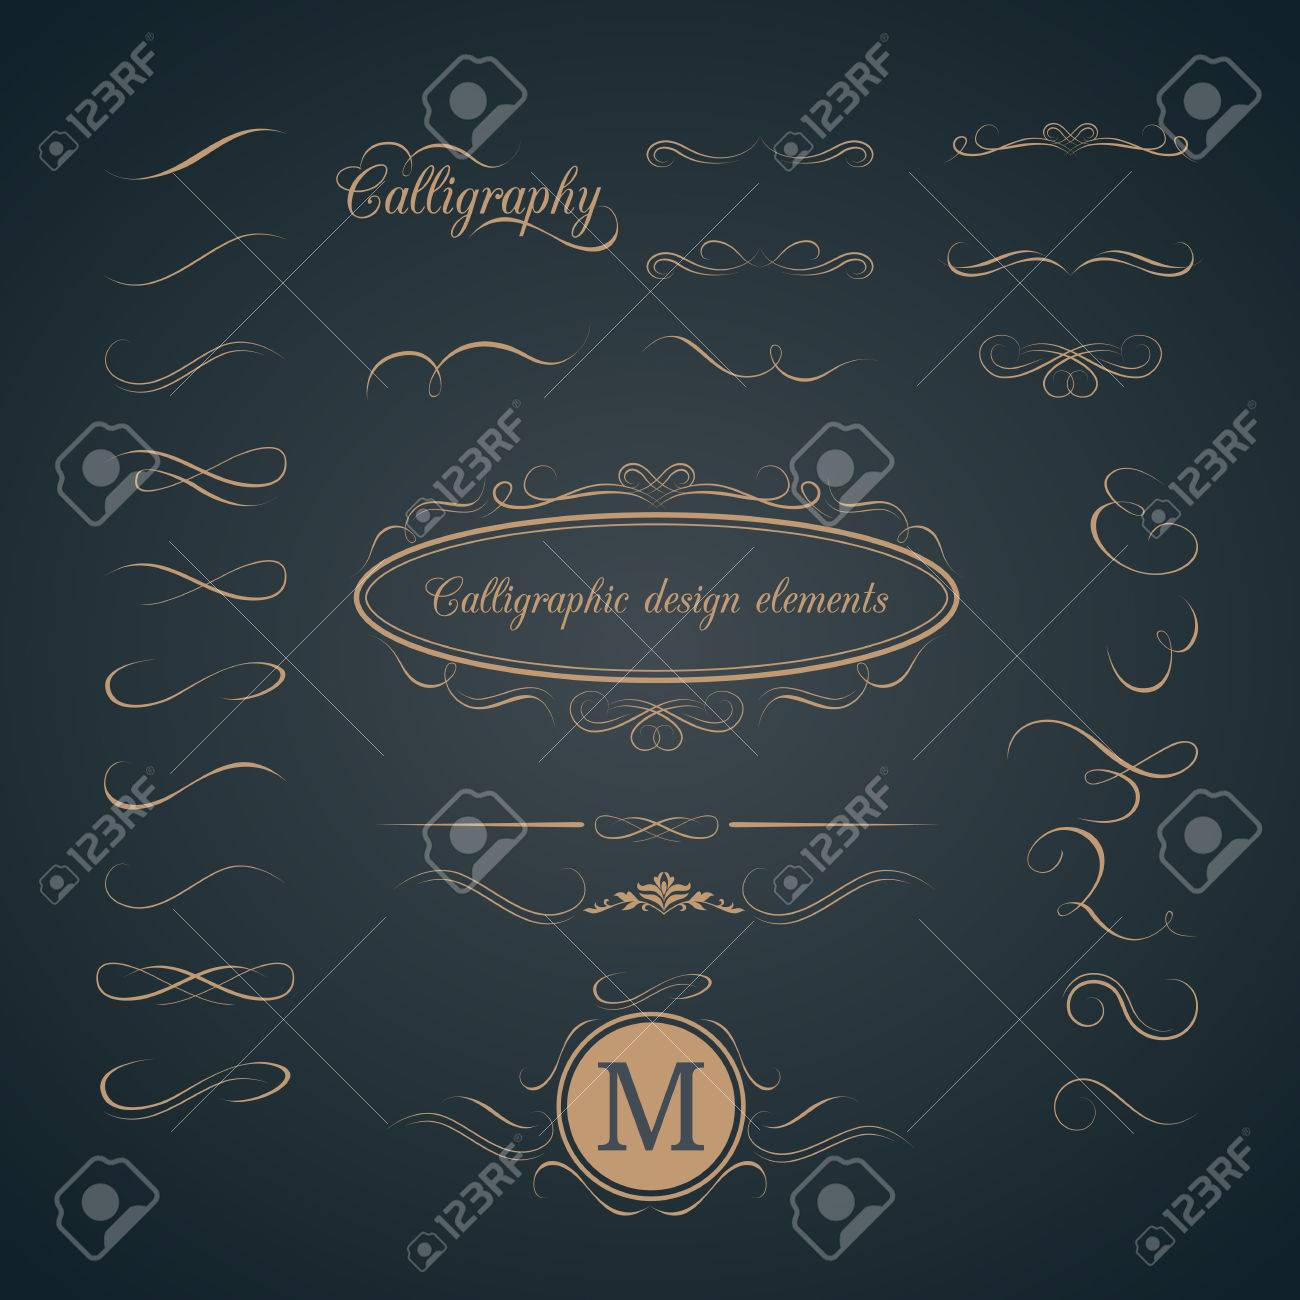 Vintage set of calligraphic design elements. Decorative elements, monogram, frame. Can be used for wedding invitation design - 51015973